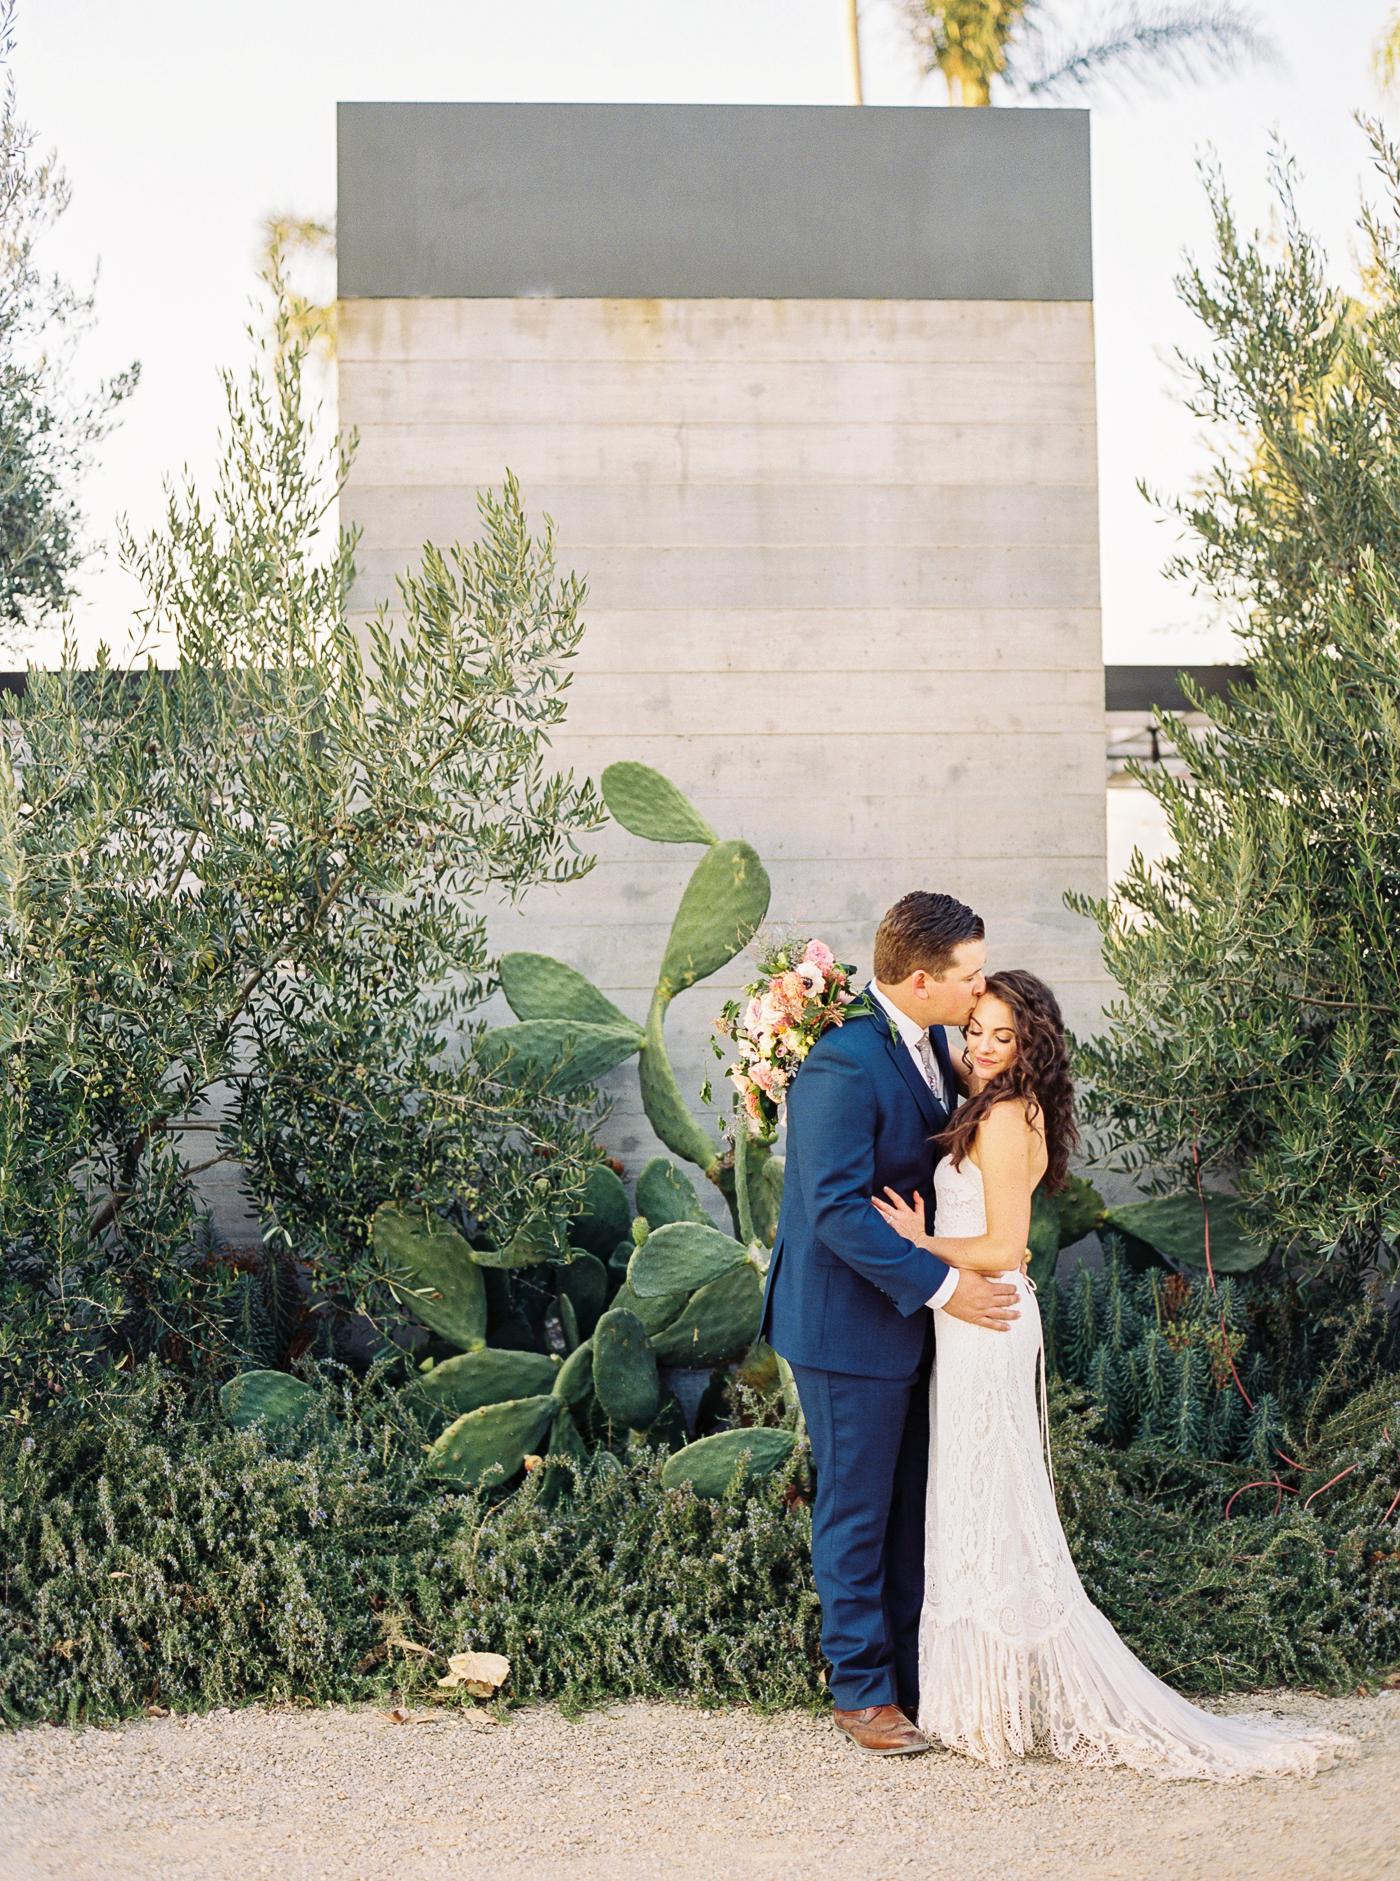 Biddle Ranch Vineyard San Luis Obispo Wedding Venue Profile Portfolio Biddle Ranch Vineyard Item 10